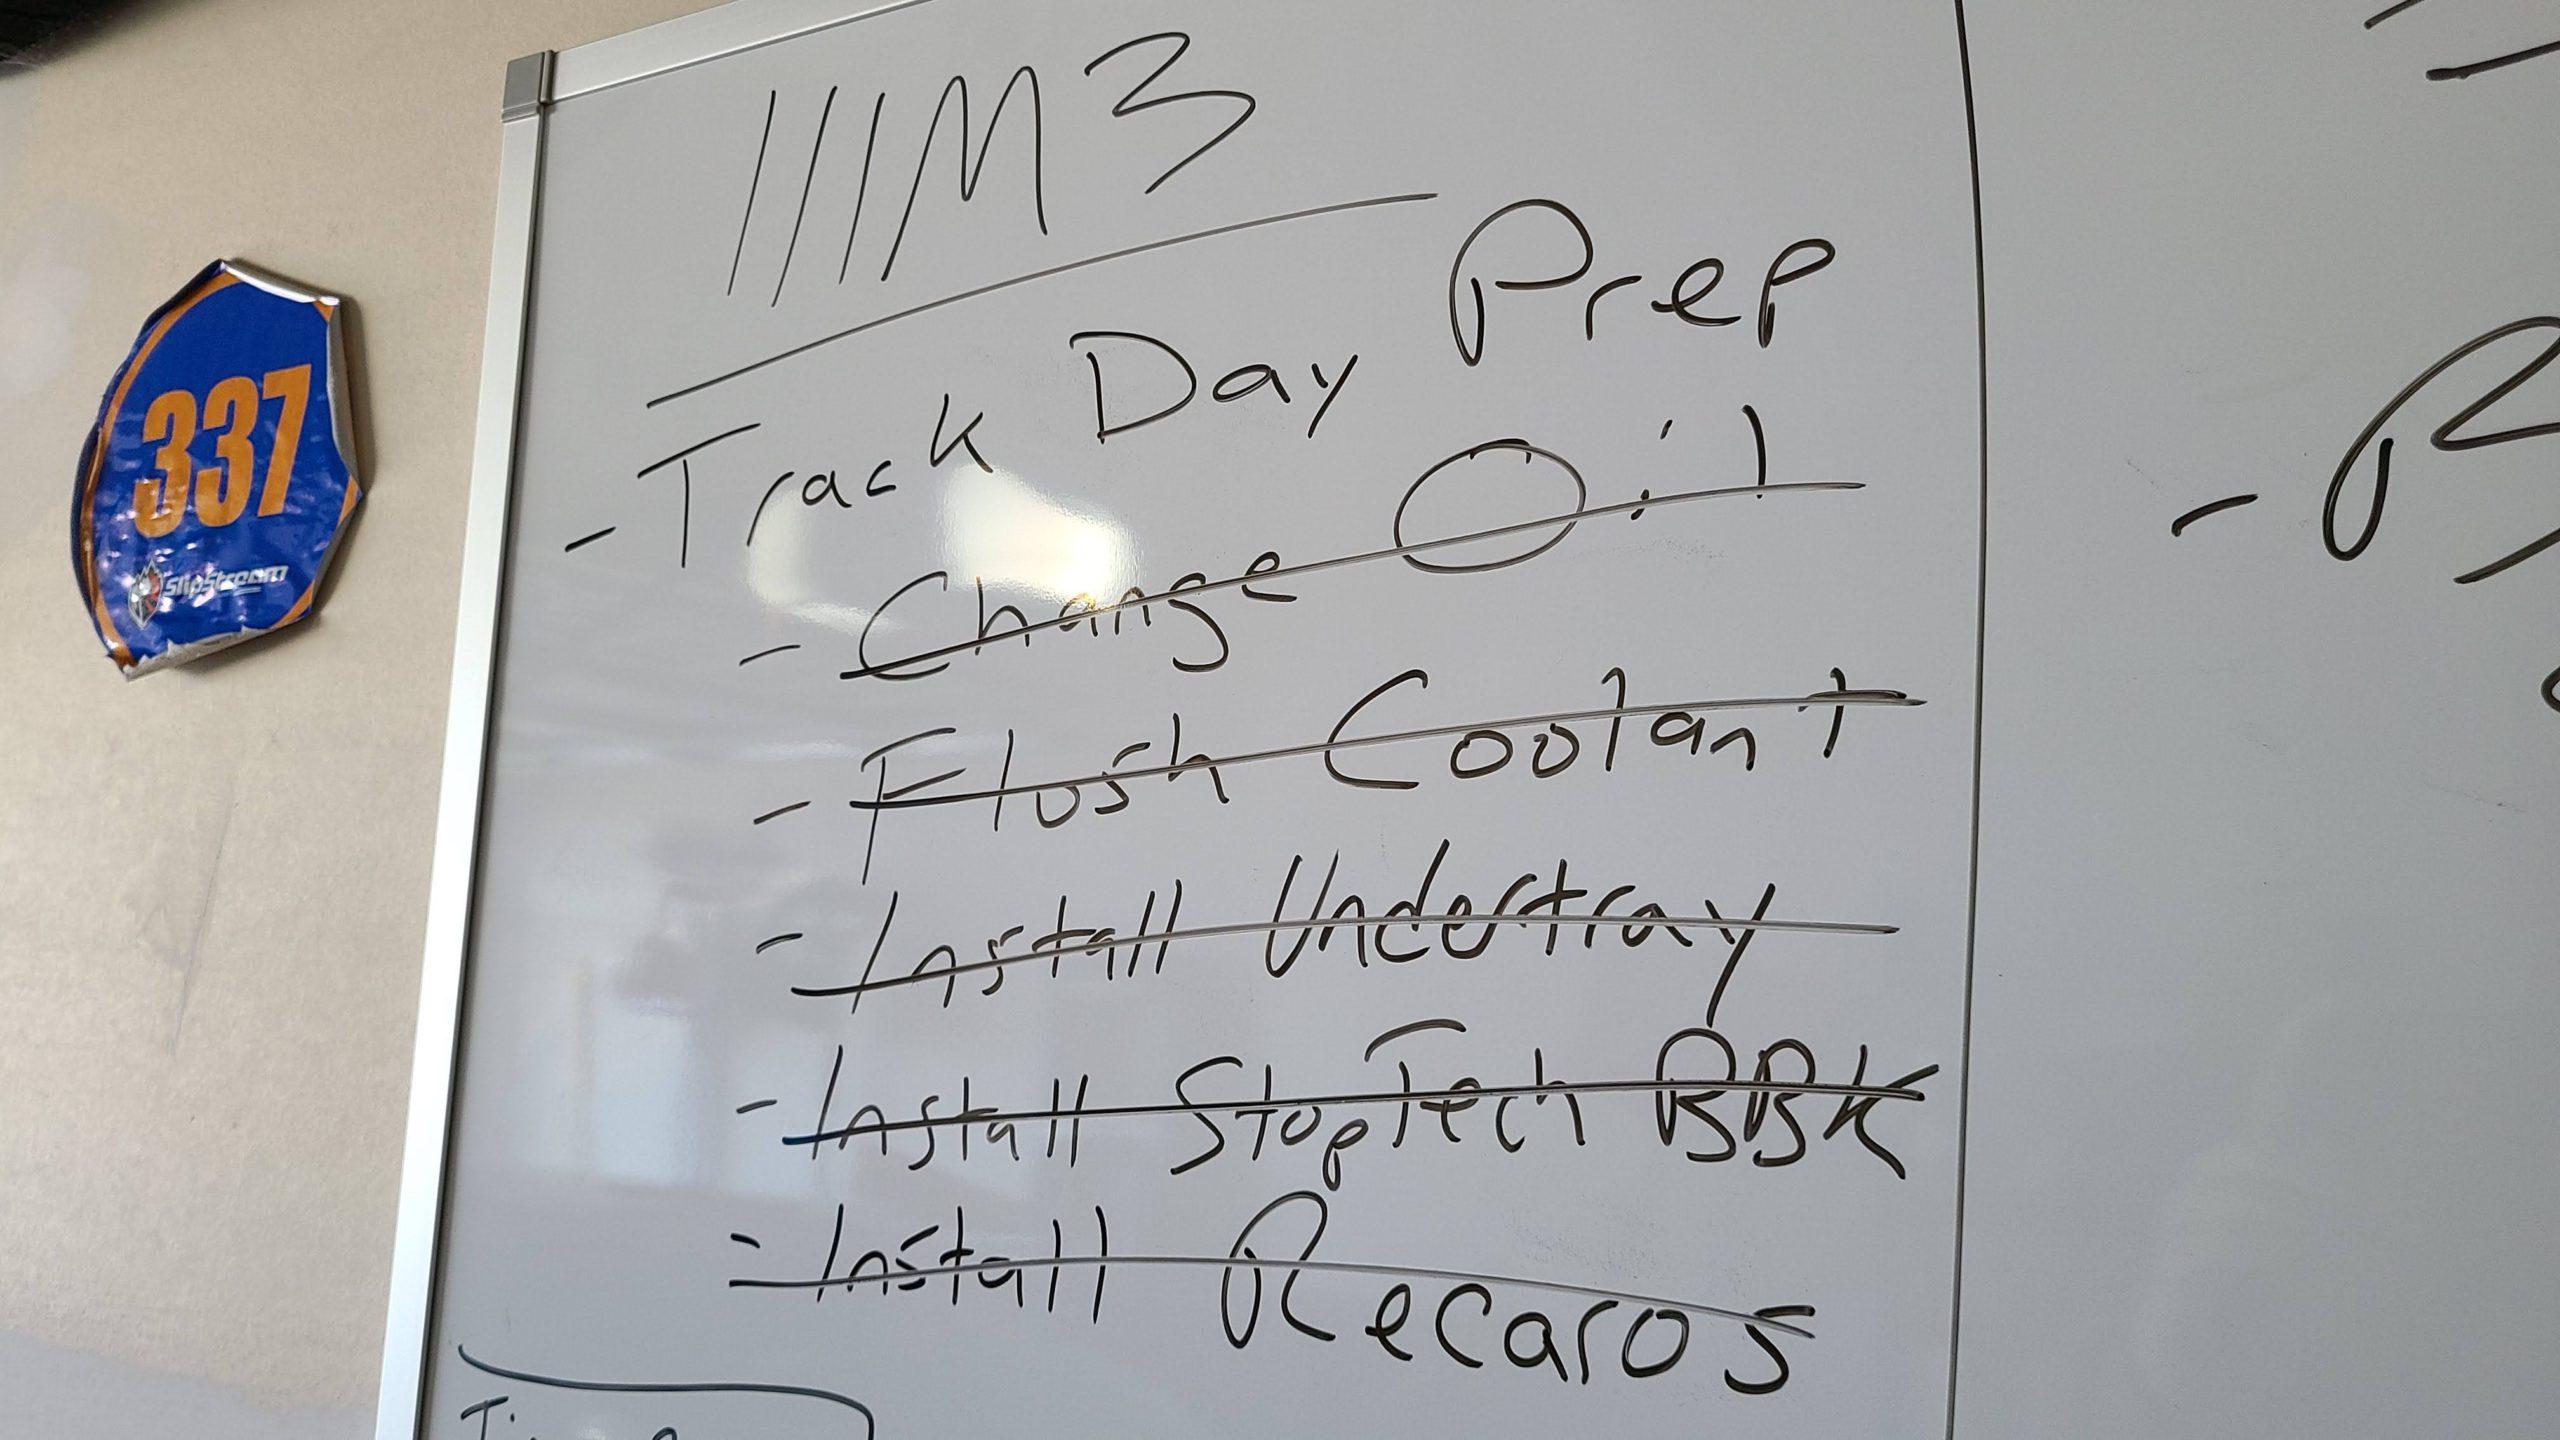 m3 track prep checklist